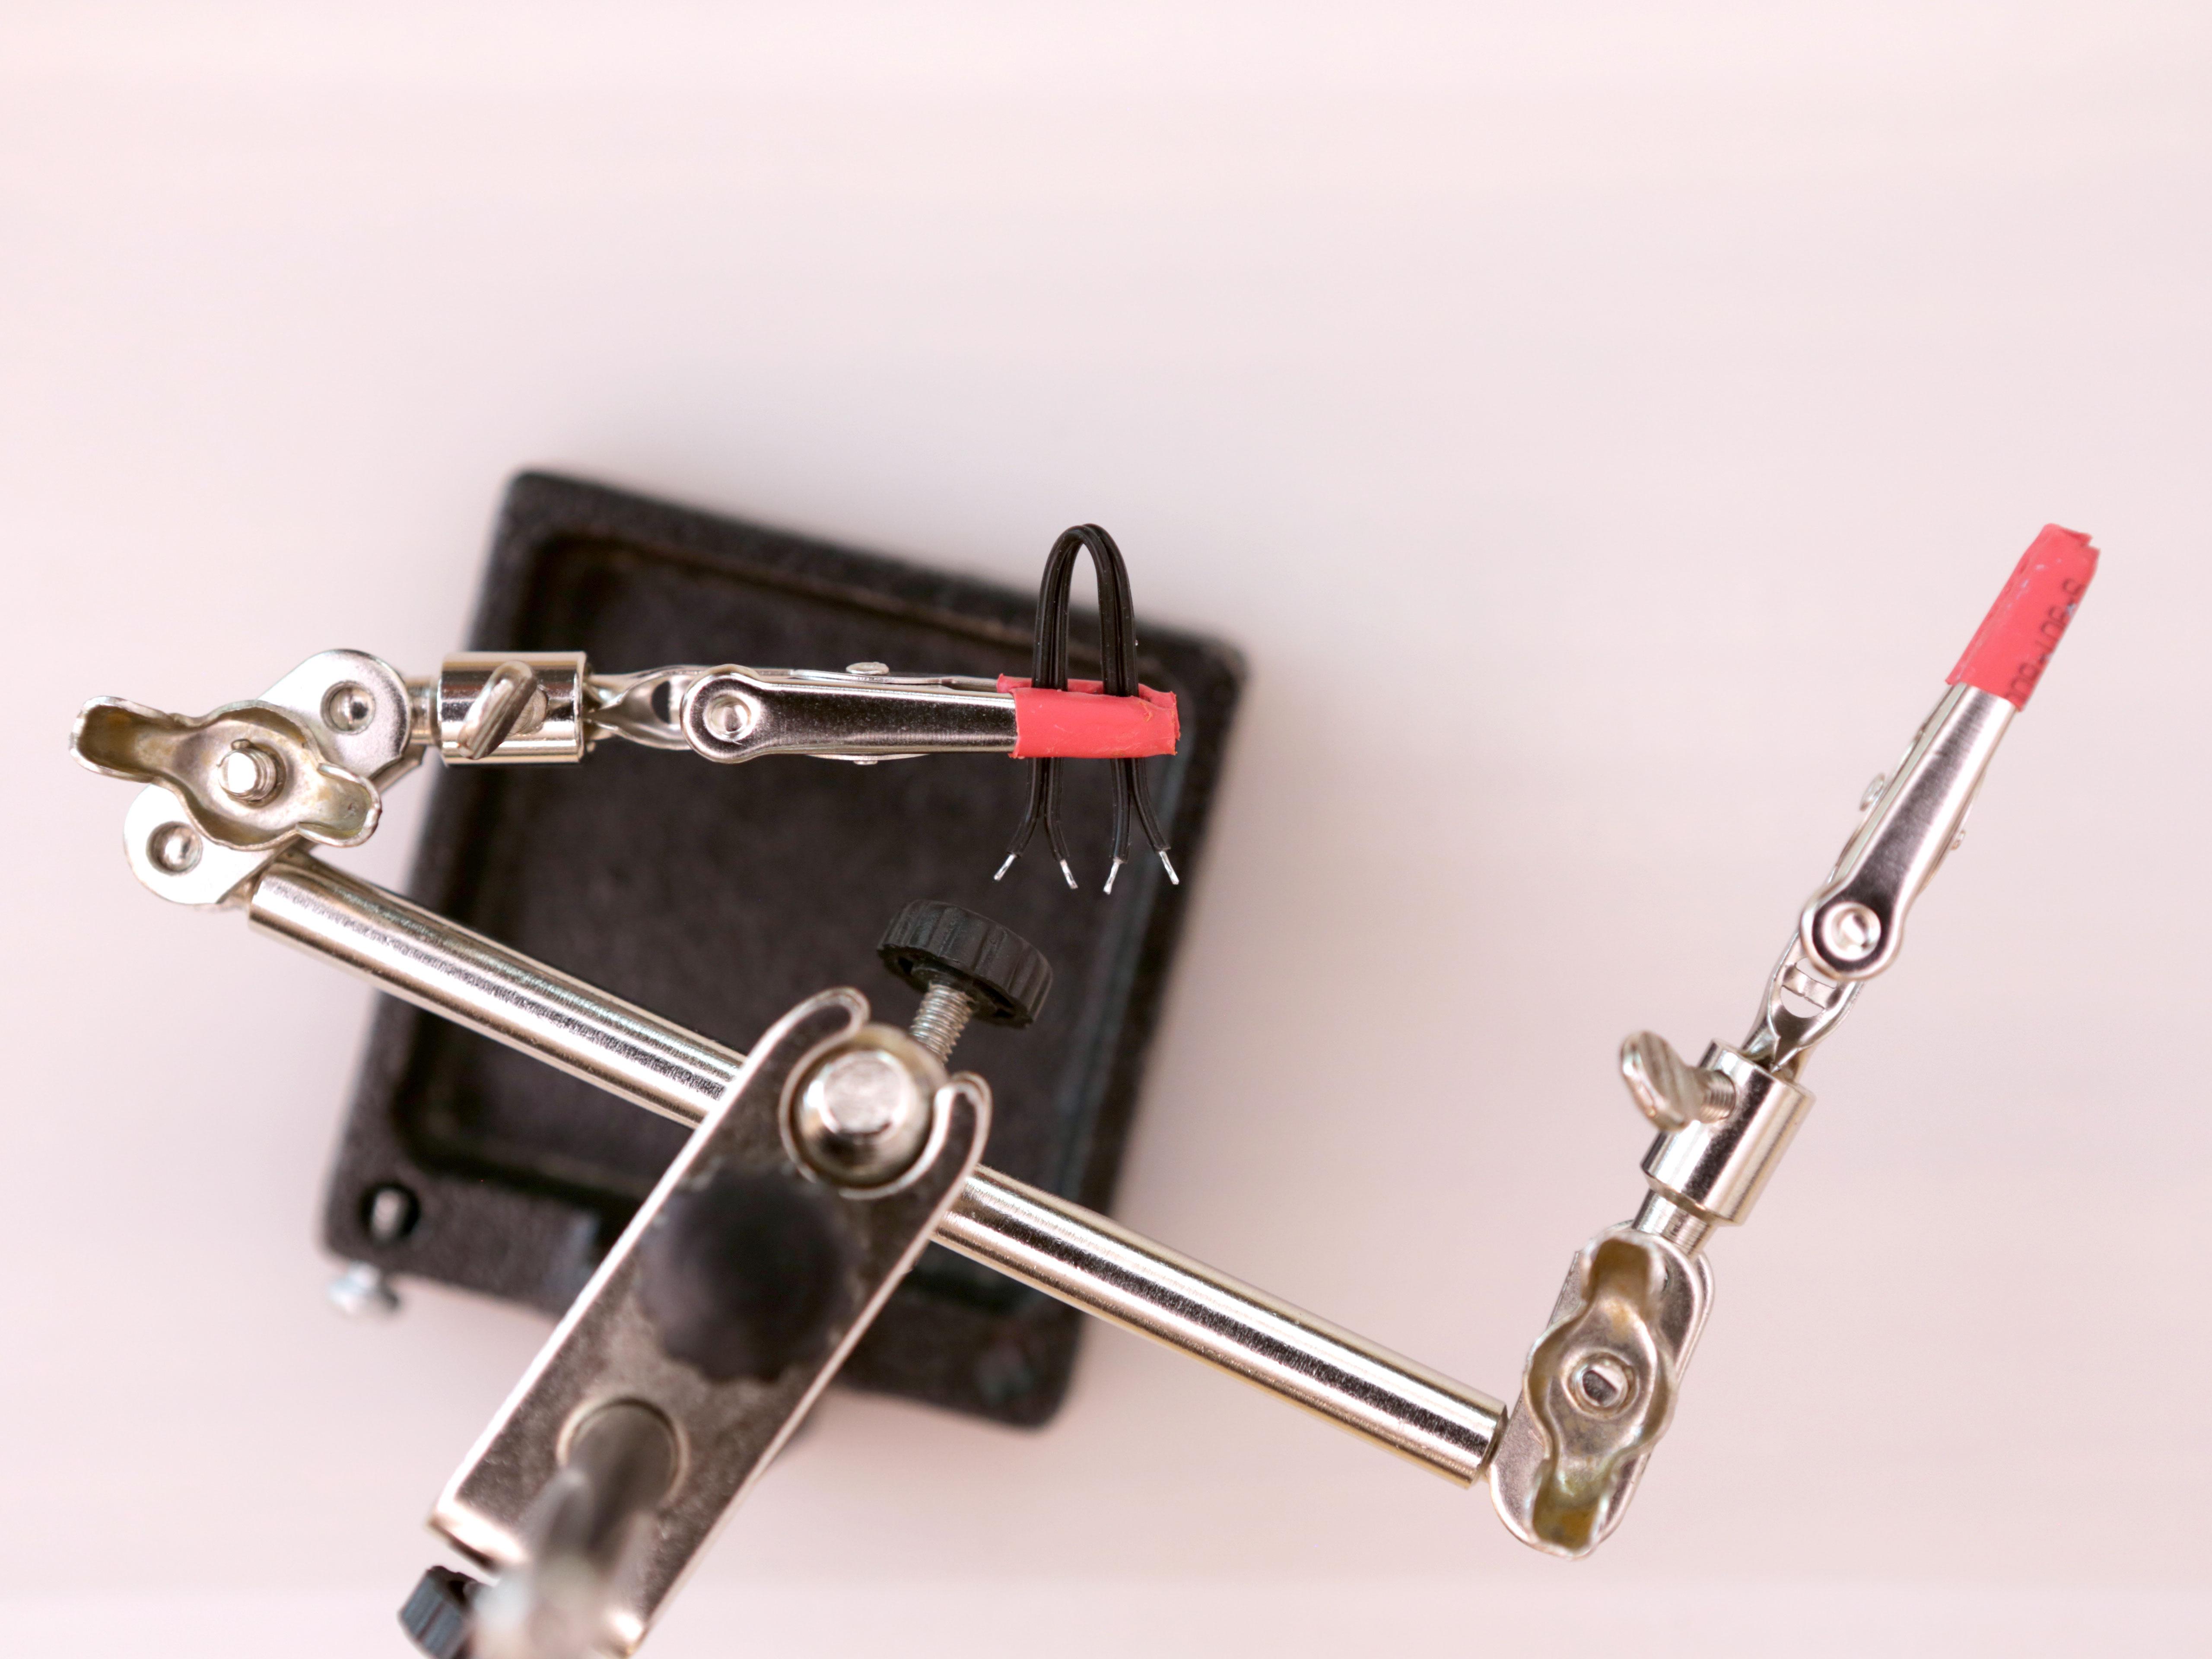 3d_printing_perma-wire-tin.jpg